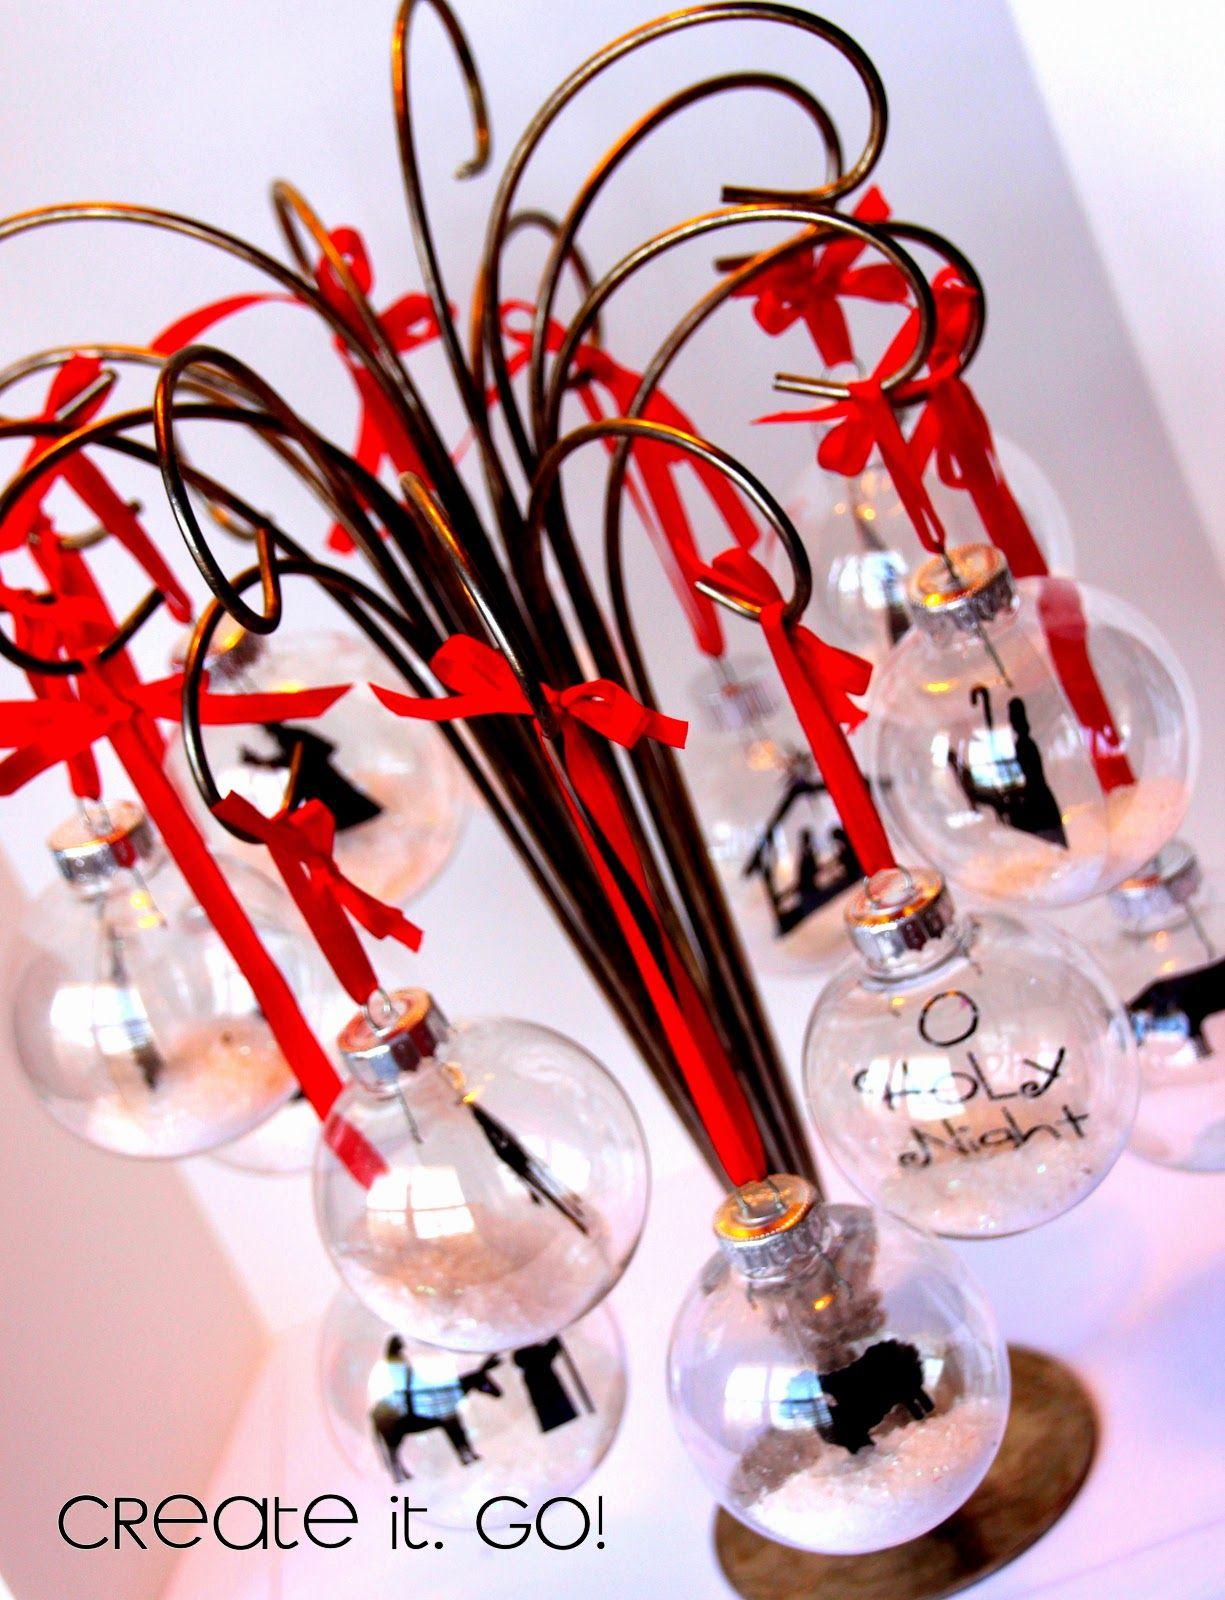 12 Days Of Christmas Nativity Ornament Set Re Do Nativity Ornaments Christmas Ornaments To Make Christmas Nativity